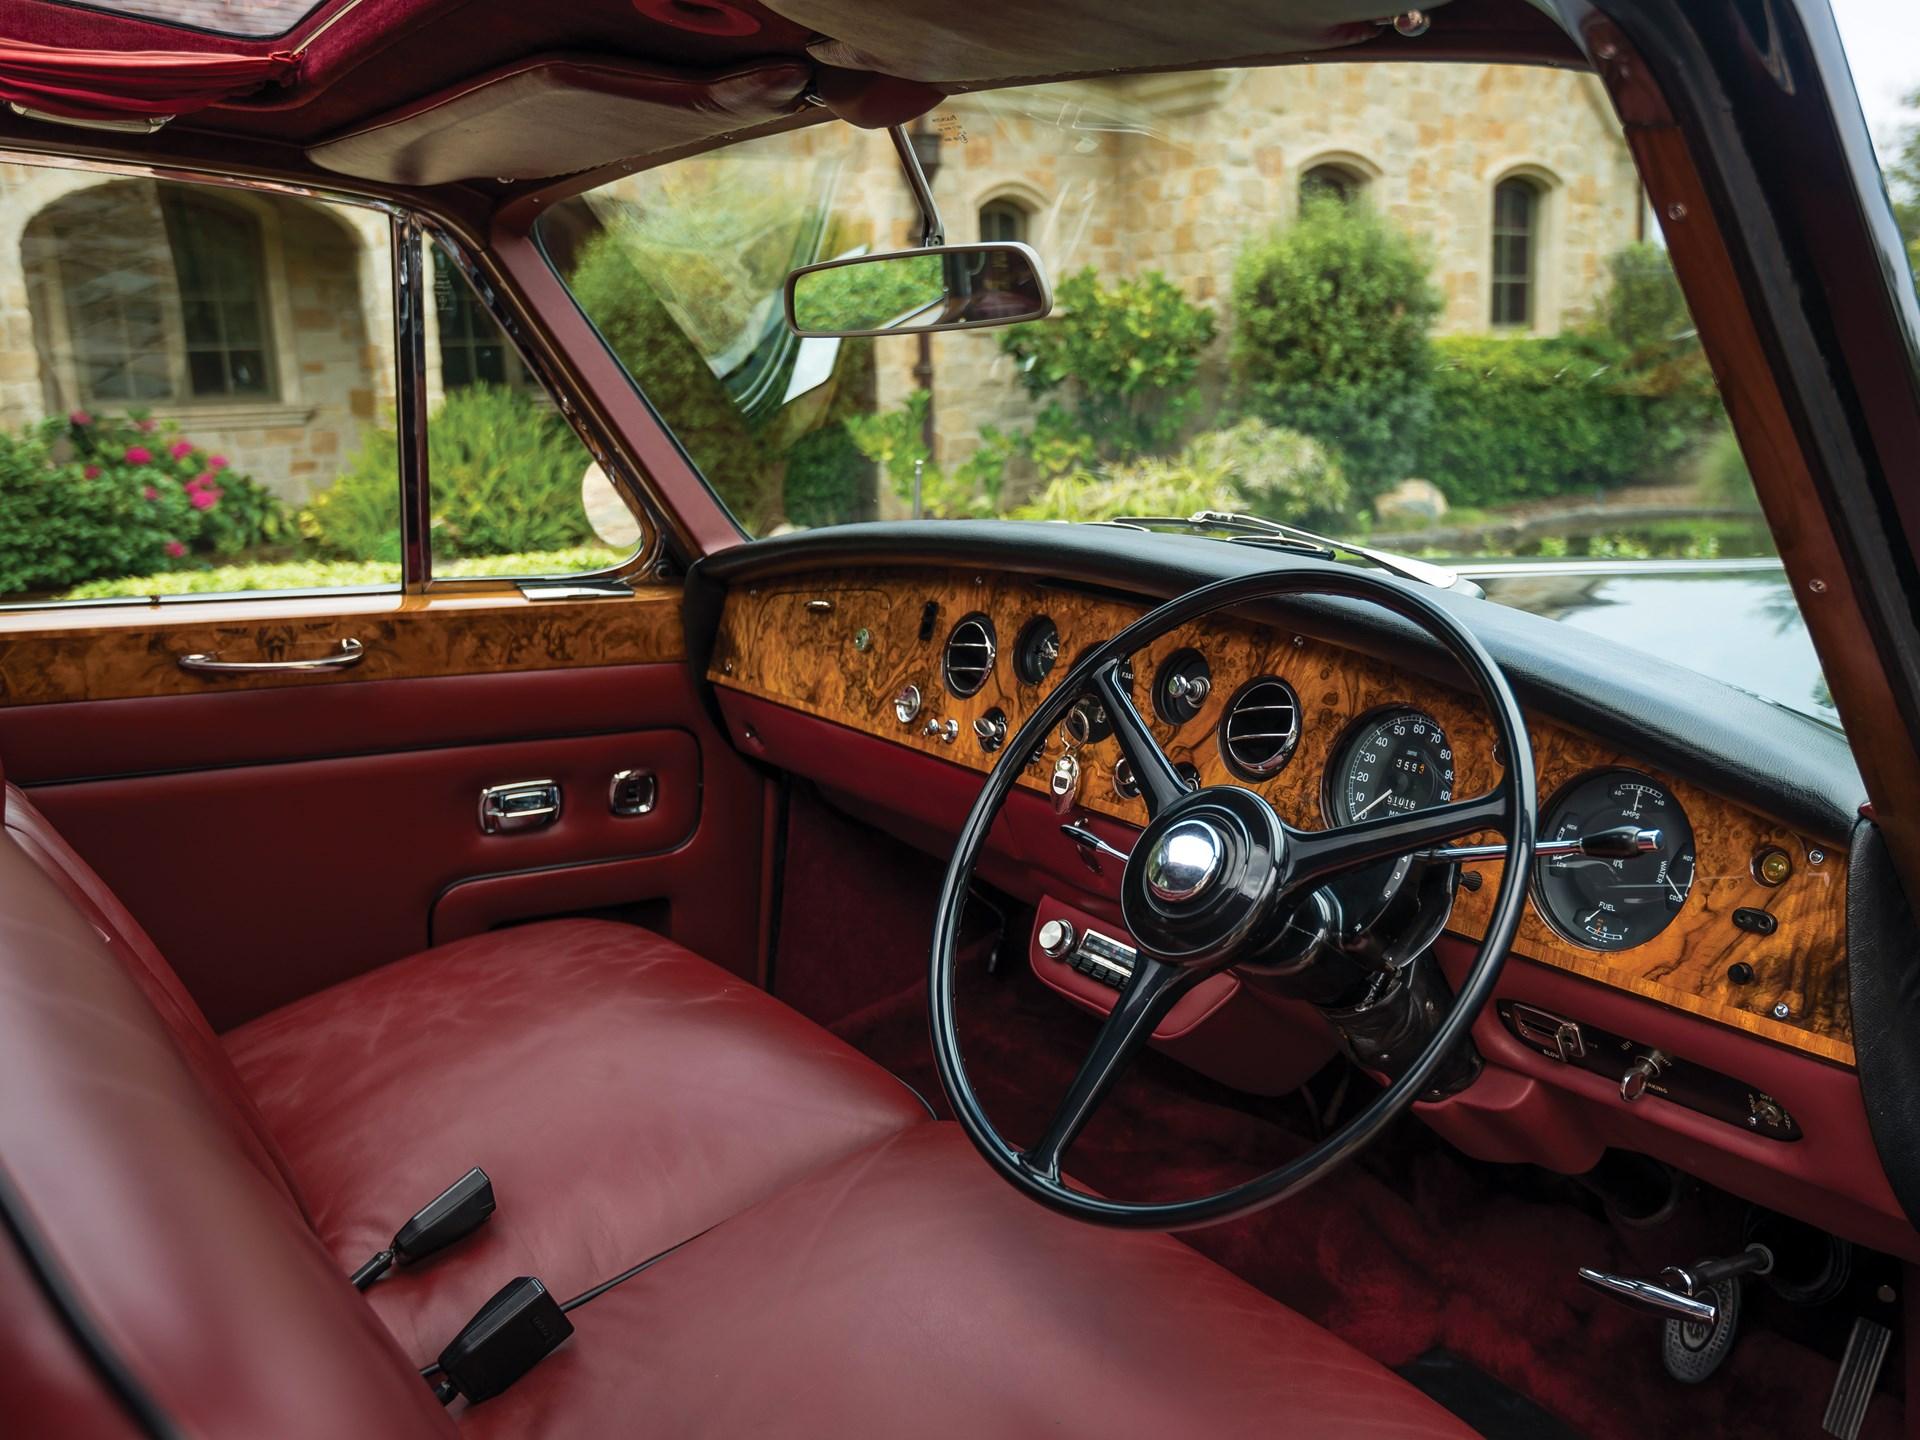 Rm Sothebys 1972 Rolls Royce Phantom Vi Limousine By Mulliner Trumph Boots Darkbrown Park Ward